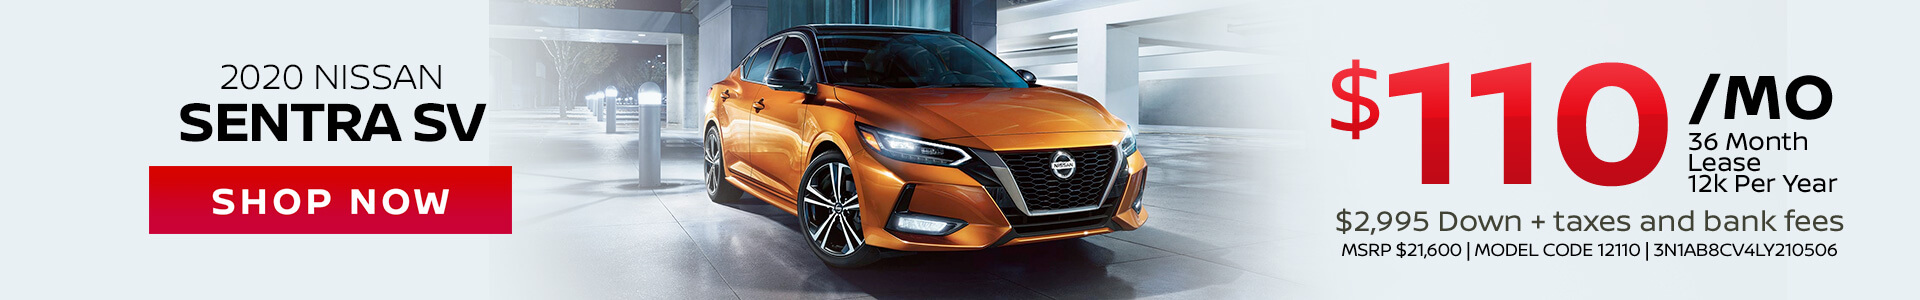 Nissan Sentra $110 Lease